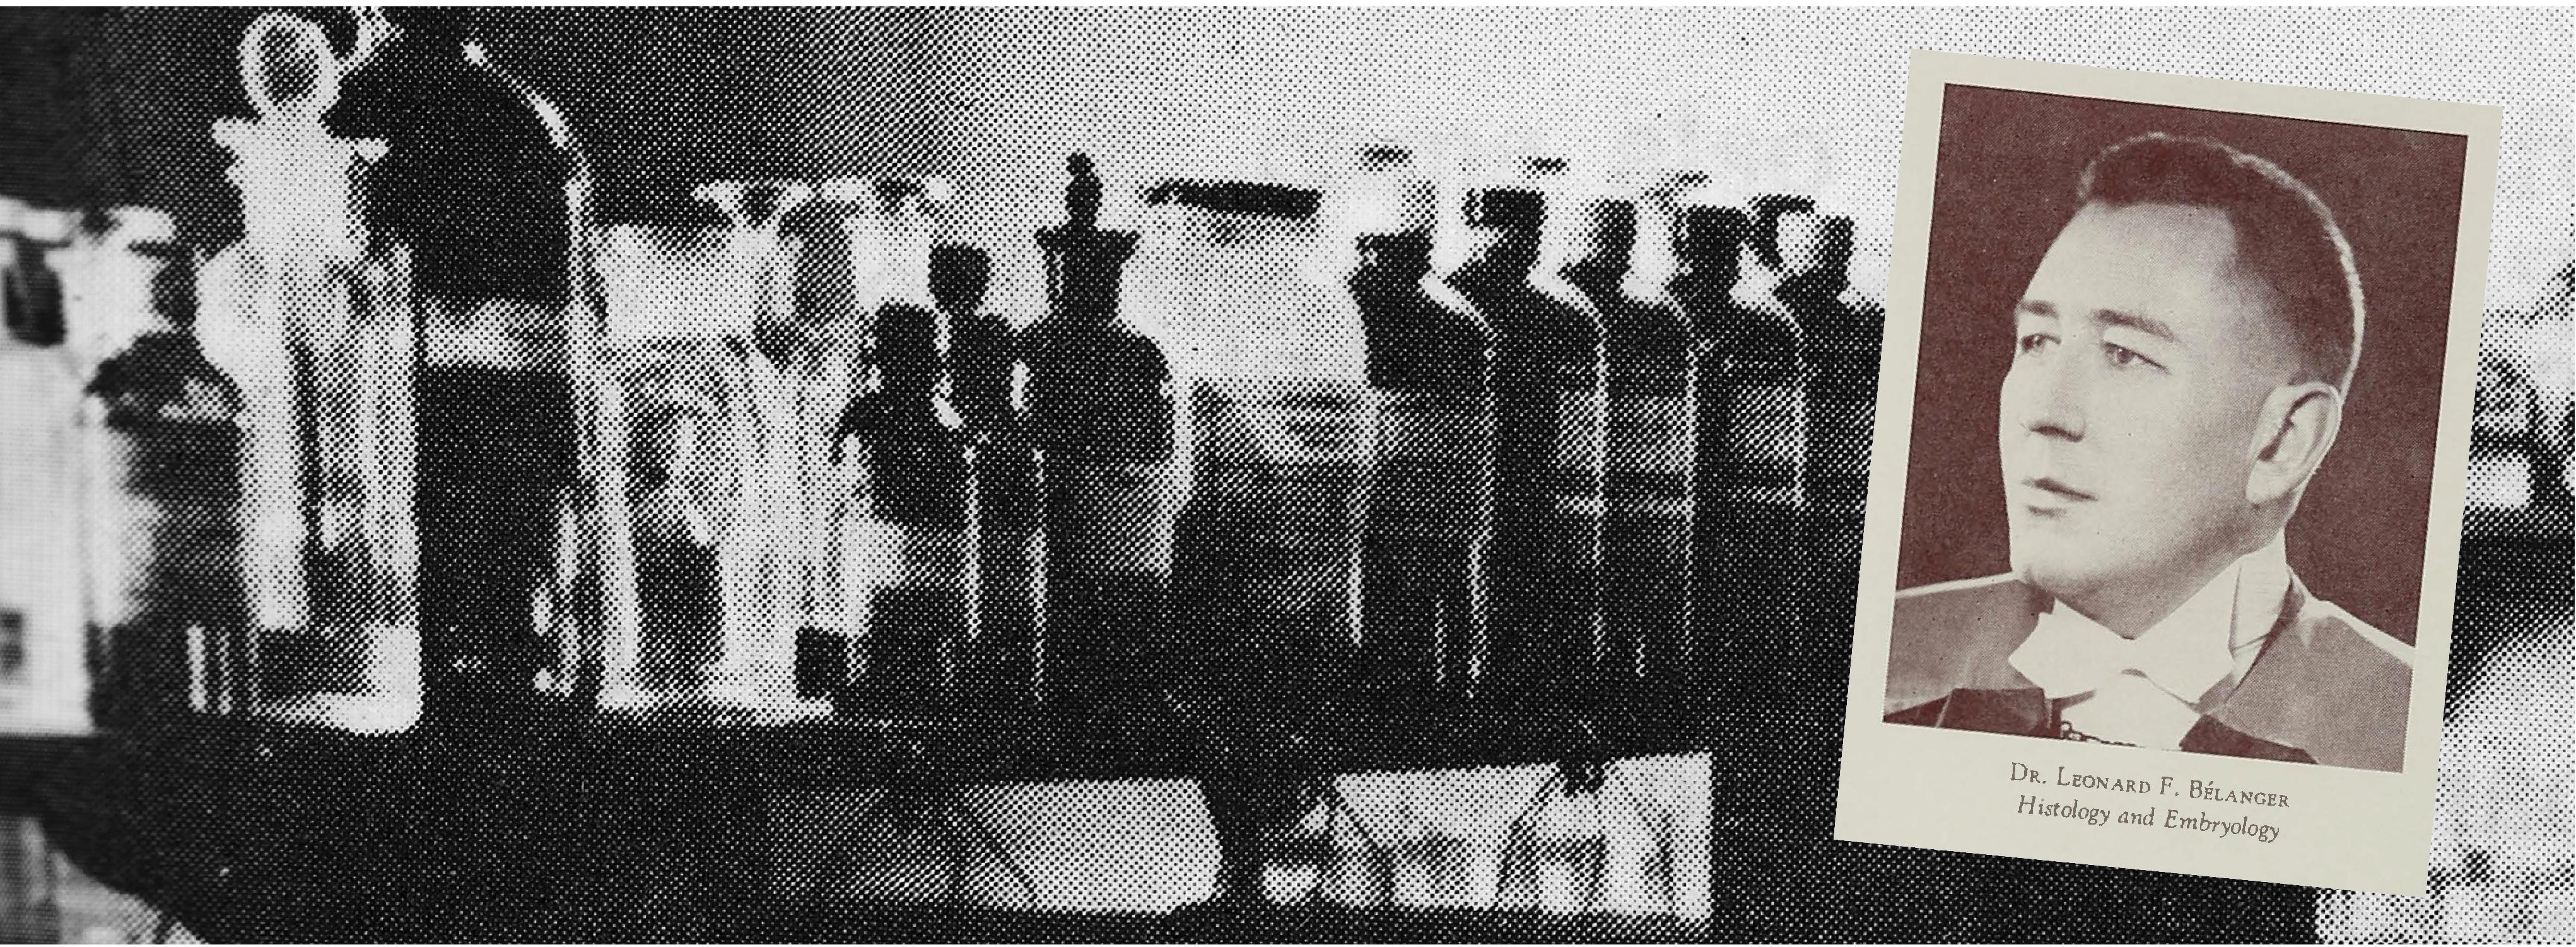 Bottles in a lab